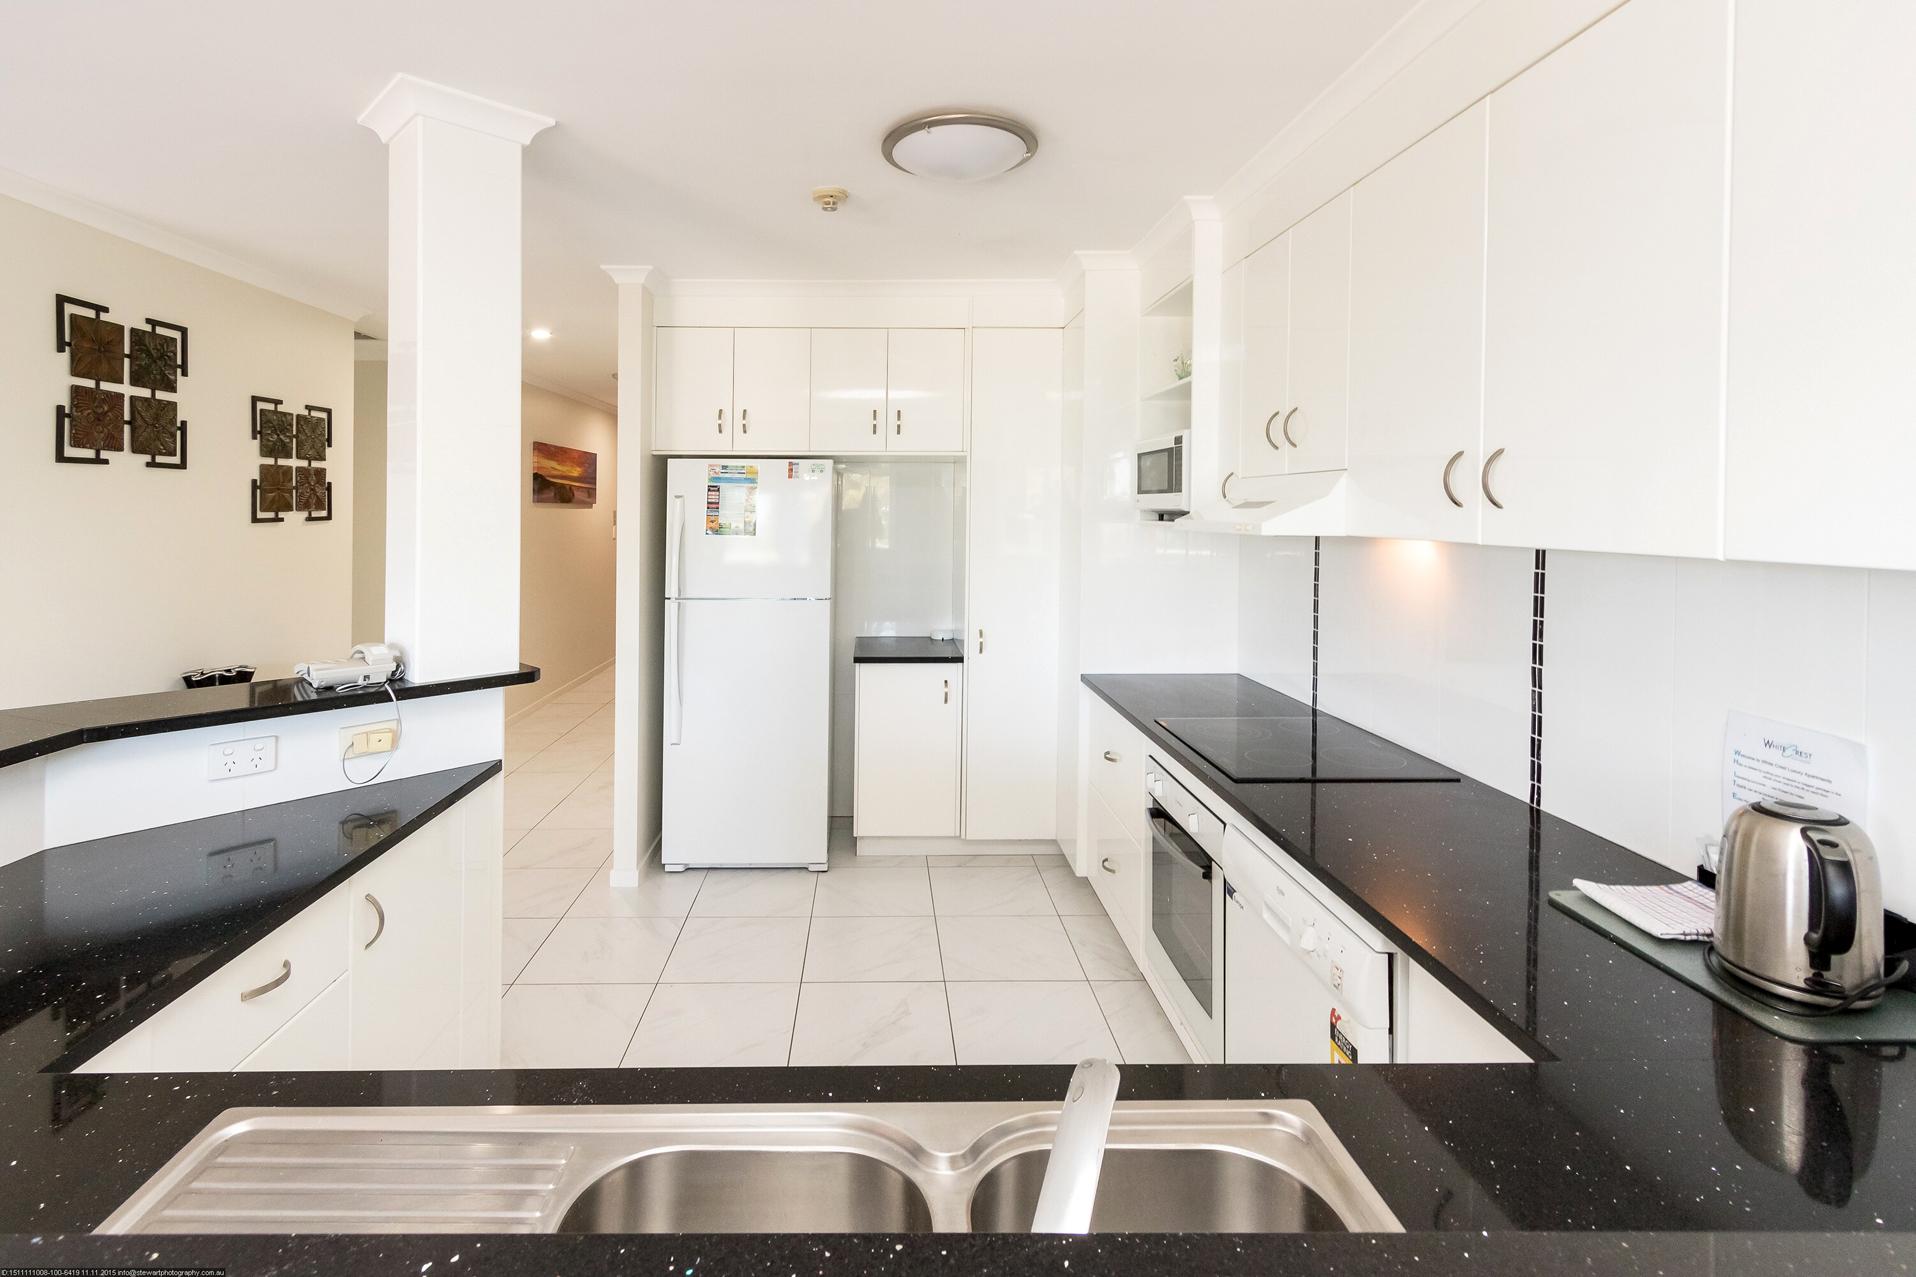 d - White Crest Luxury Apartments